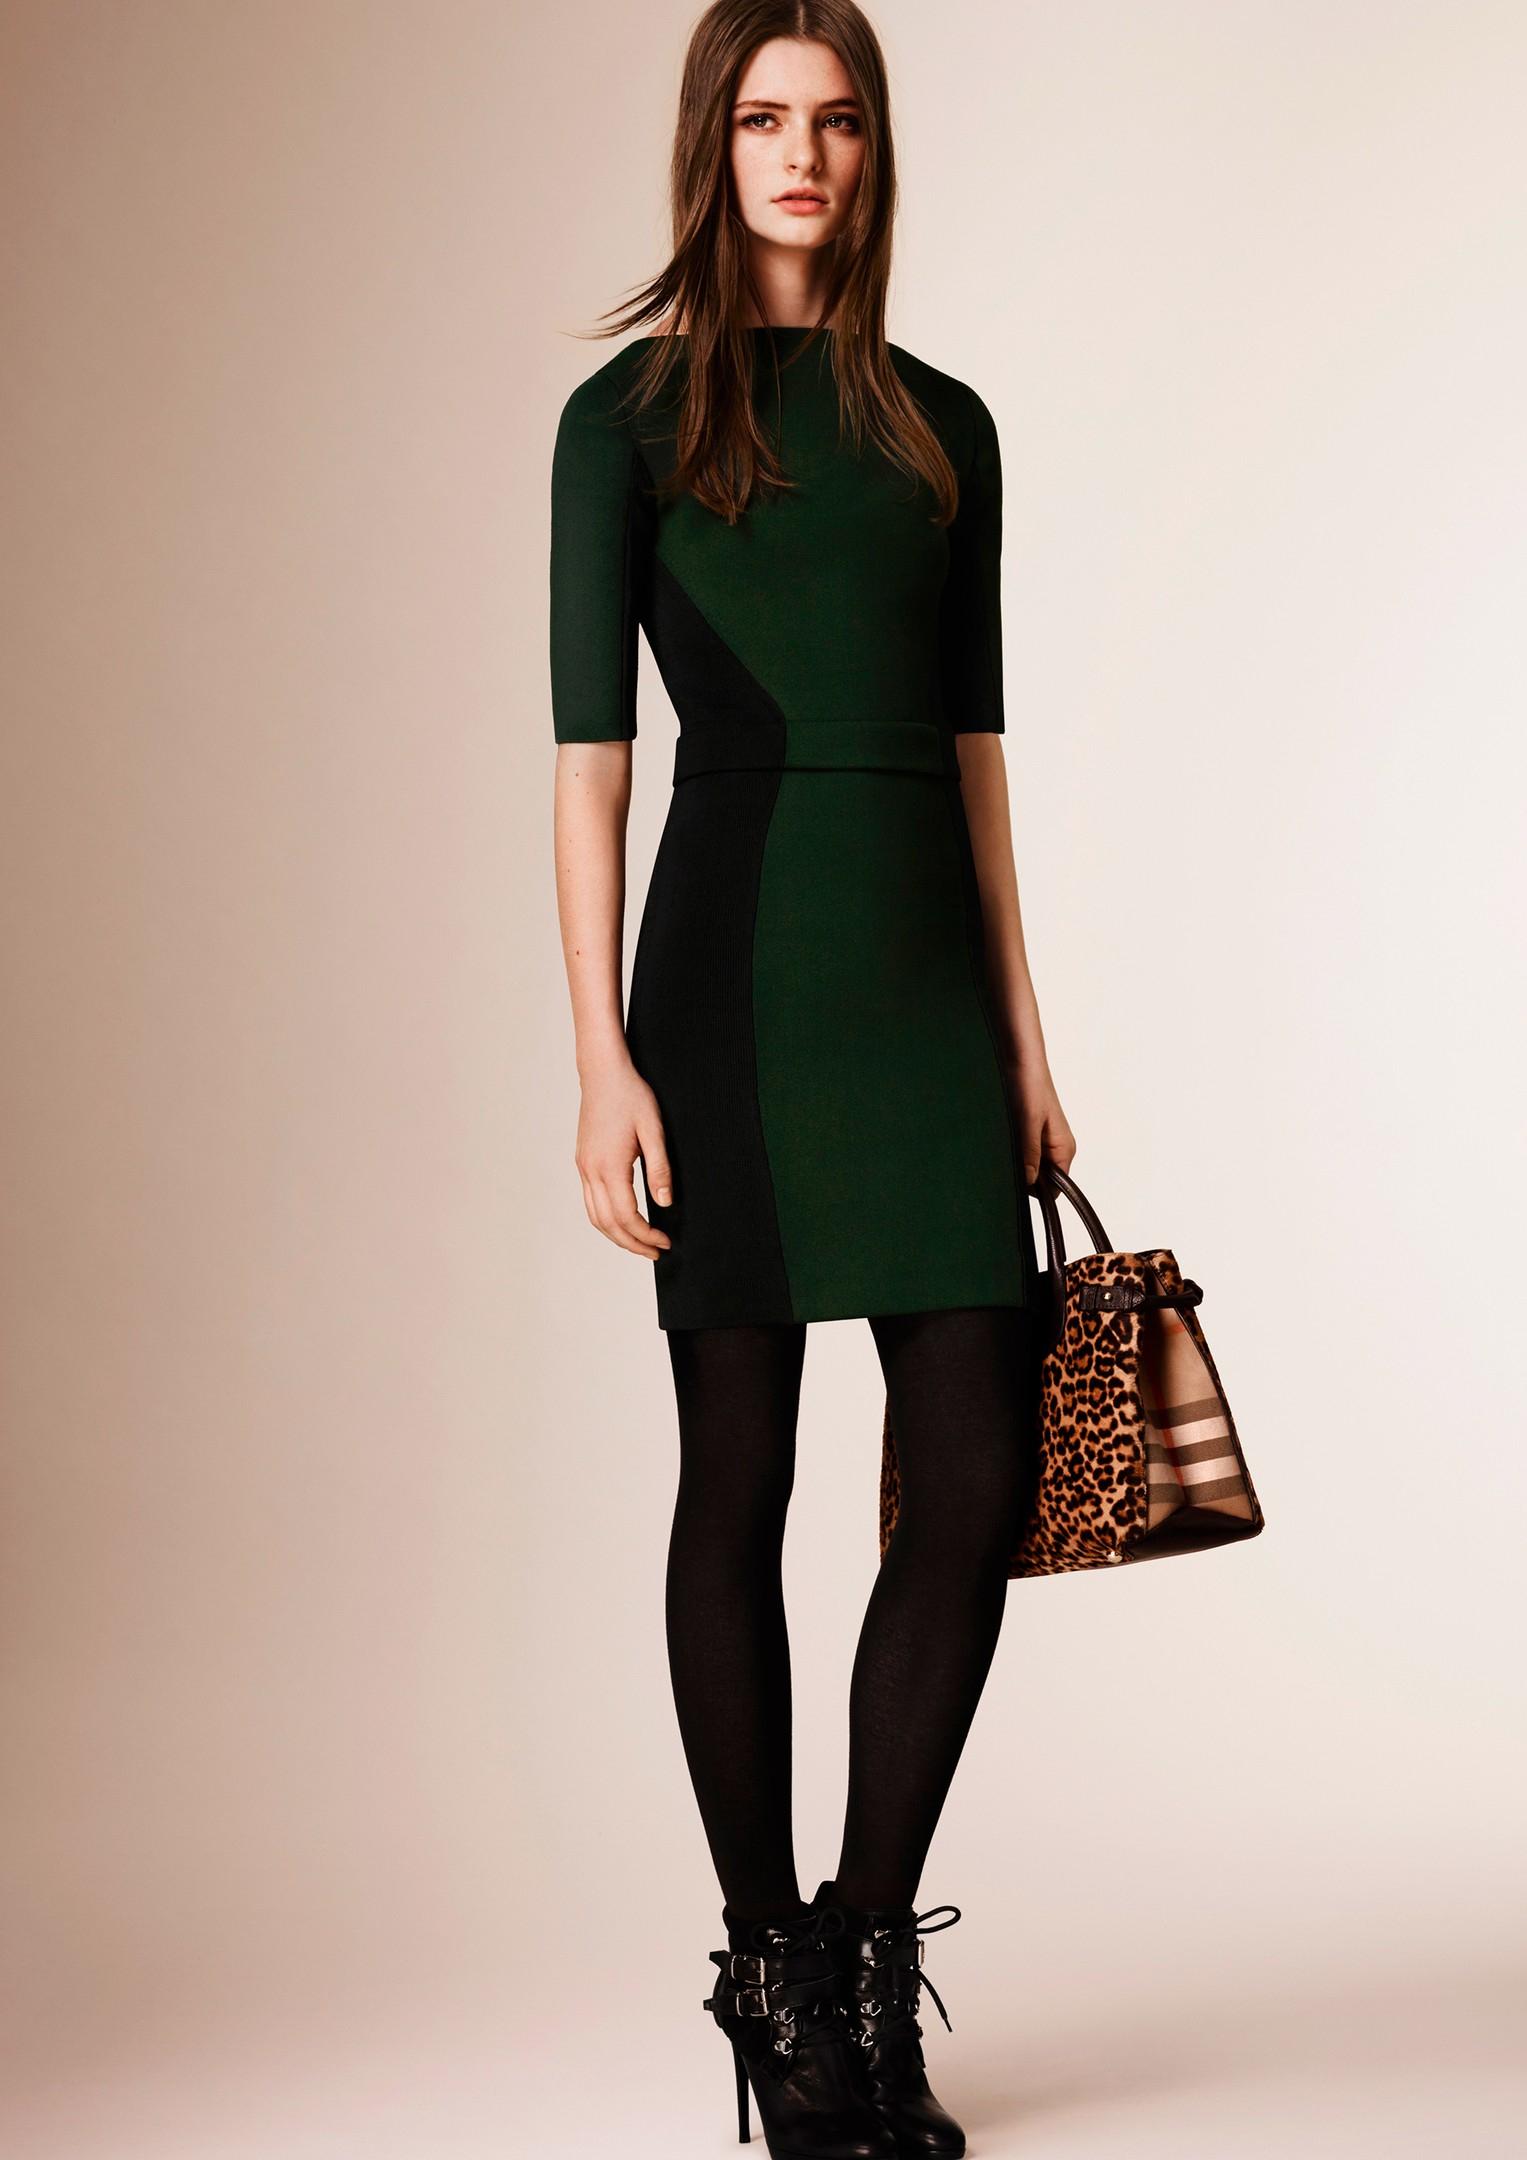 lyst burberry knit dress in green. Black Bedroom Furniture Sets. Home Design Ideas